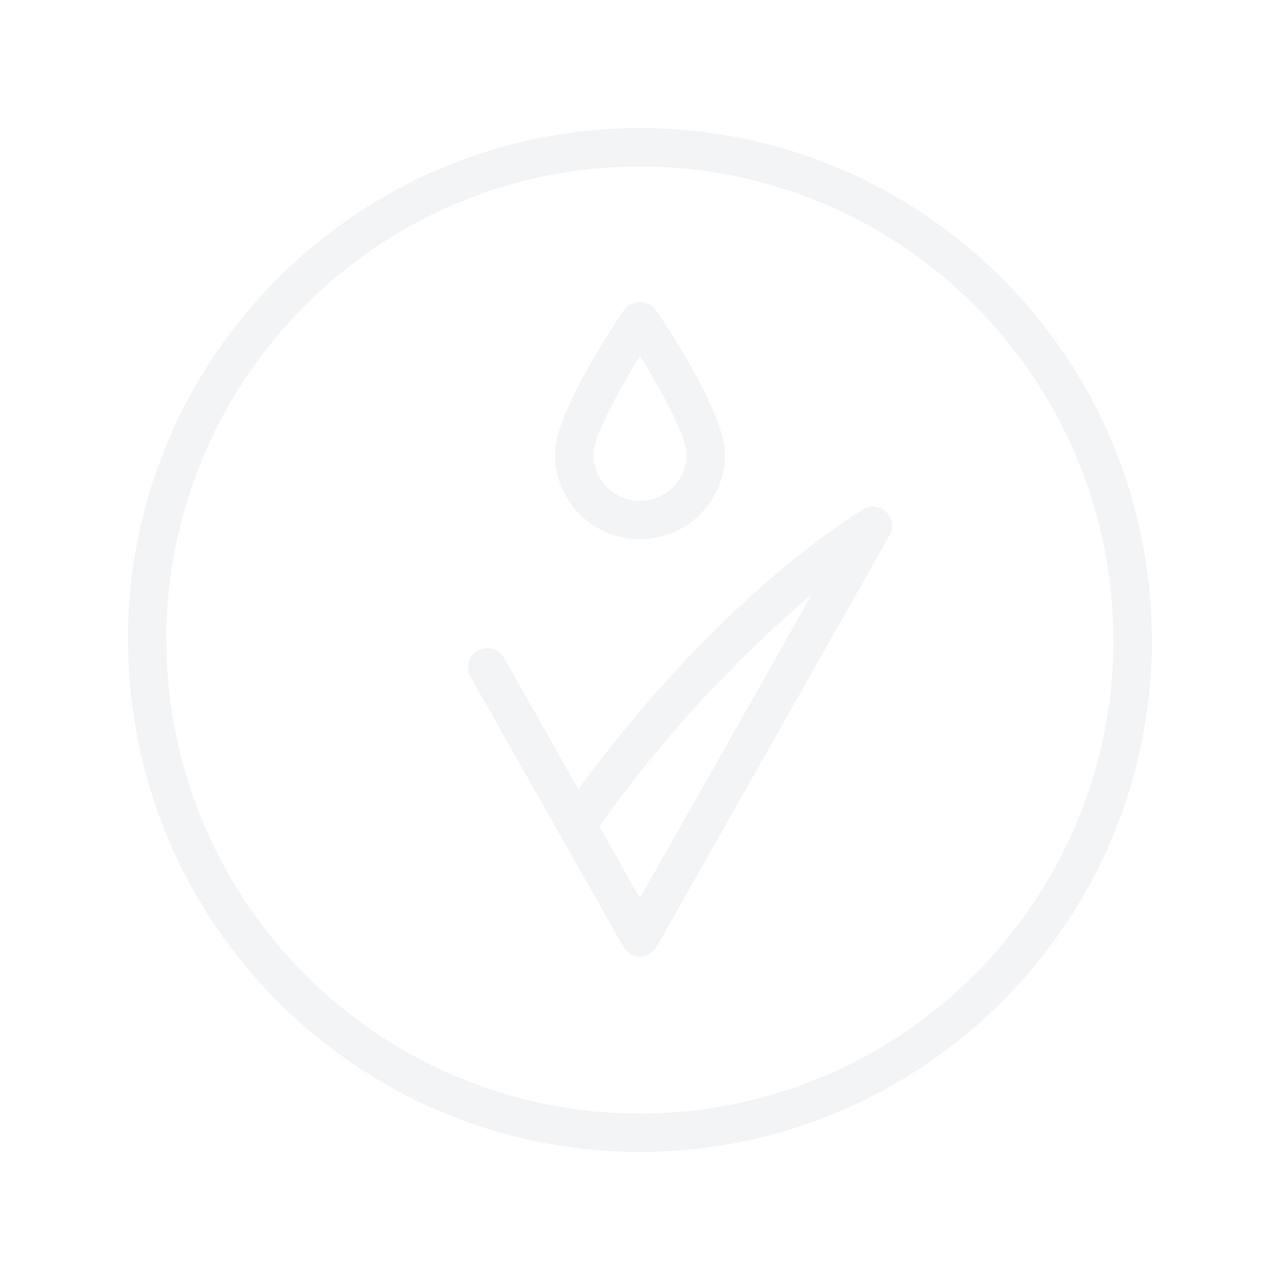 HOLIKA HOLIKA Baby Silky Hand Sheet Mask увлажняющая маска 15ml